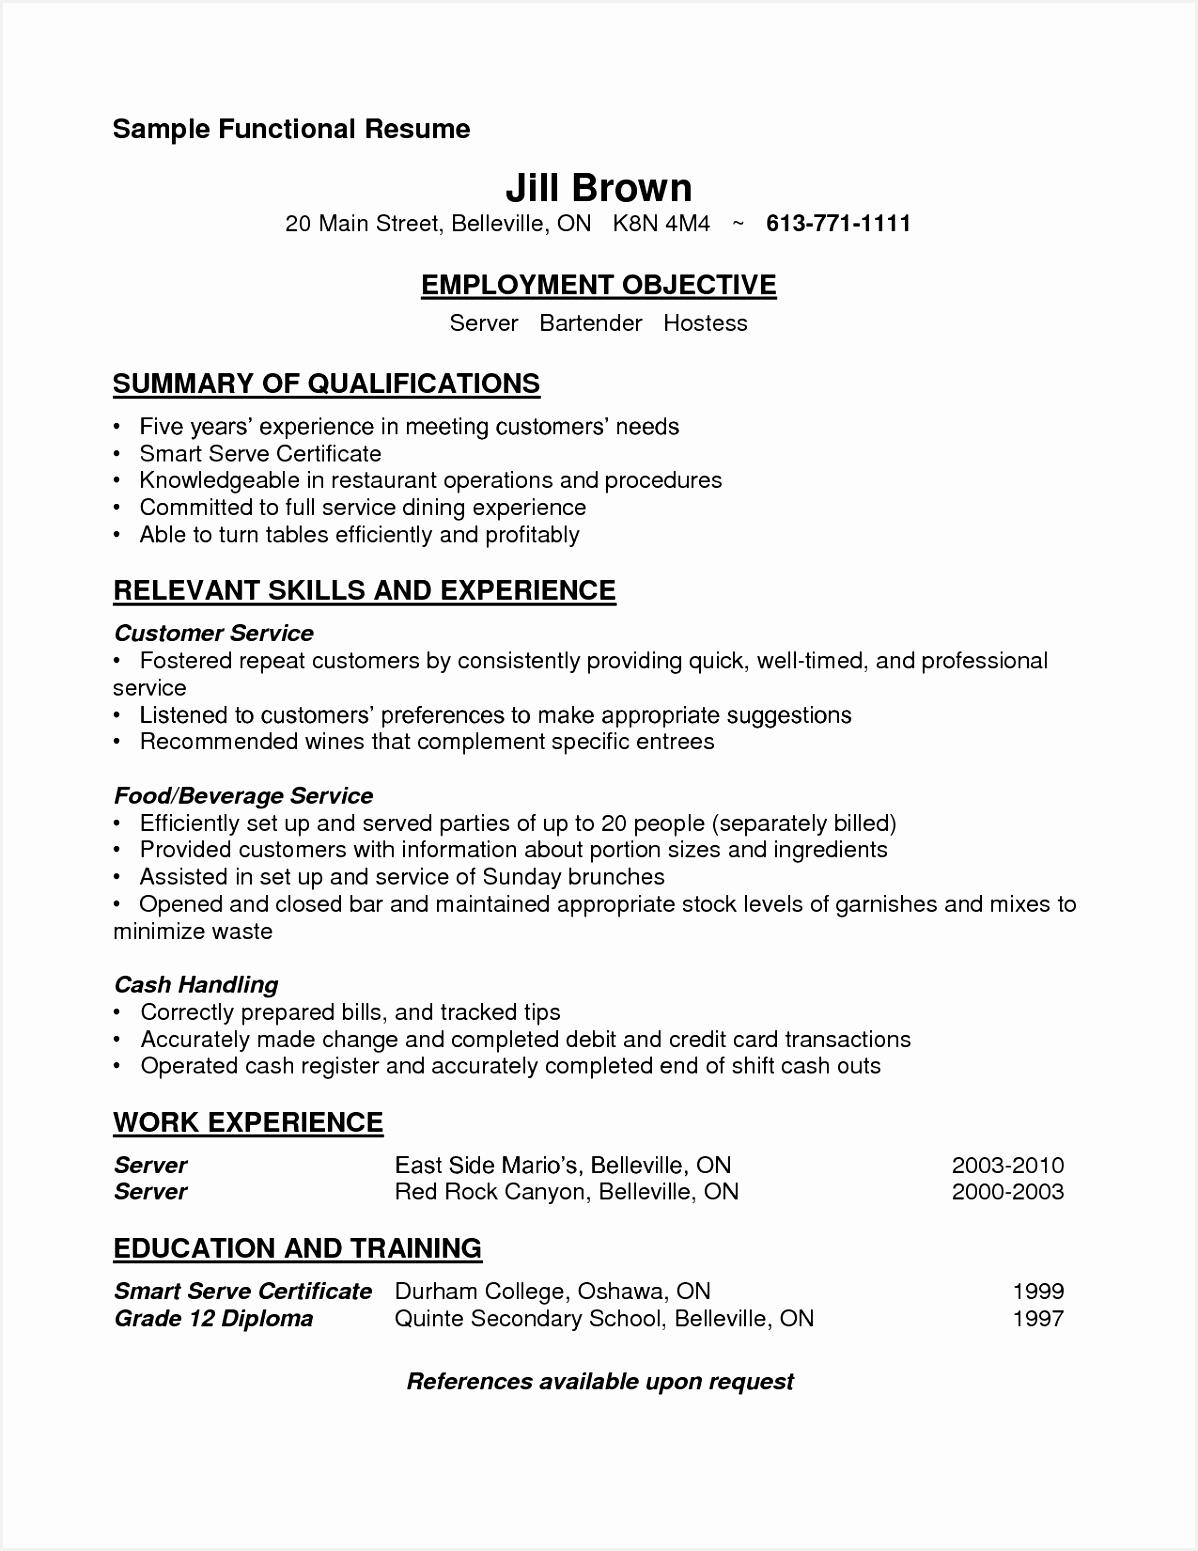 Sample Of Student Resume C6hfu Awesome Bartender Resume Templates Elegant Outline Resume Lovely American Of 10 Sample Of Student Resume